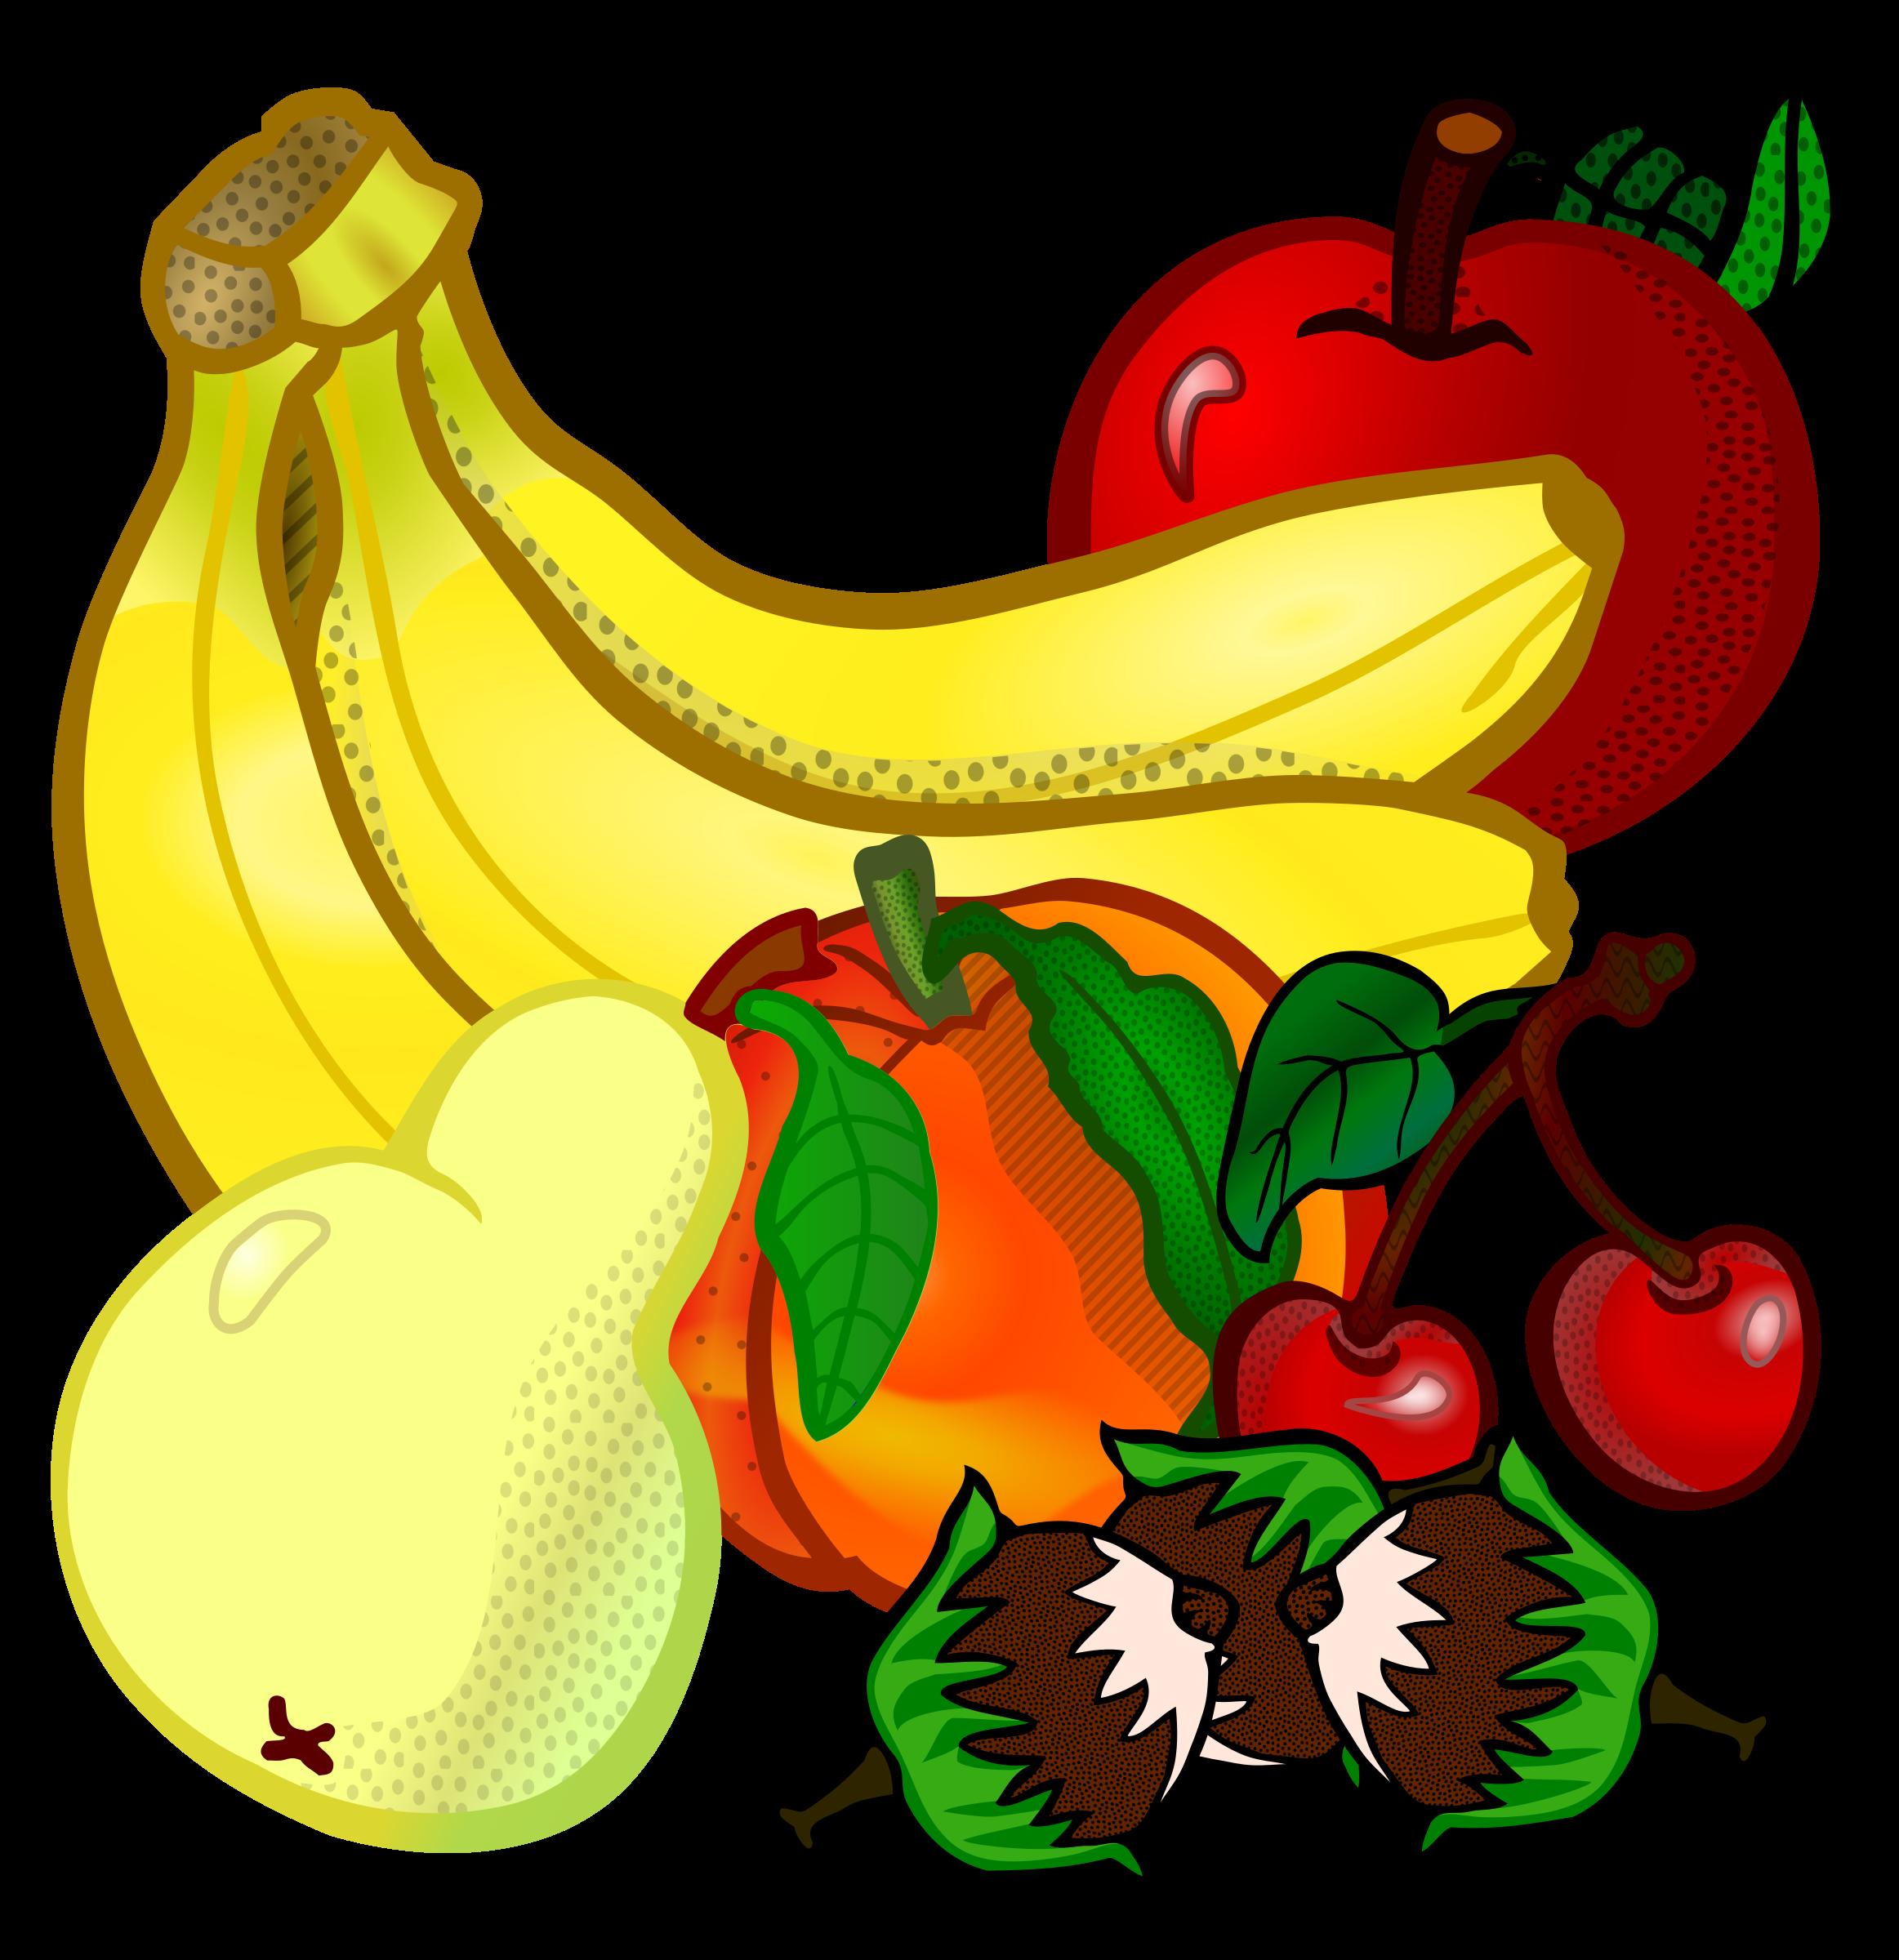 I clipart fruit. Fruits coloured big image